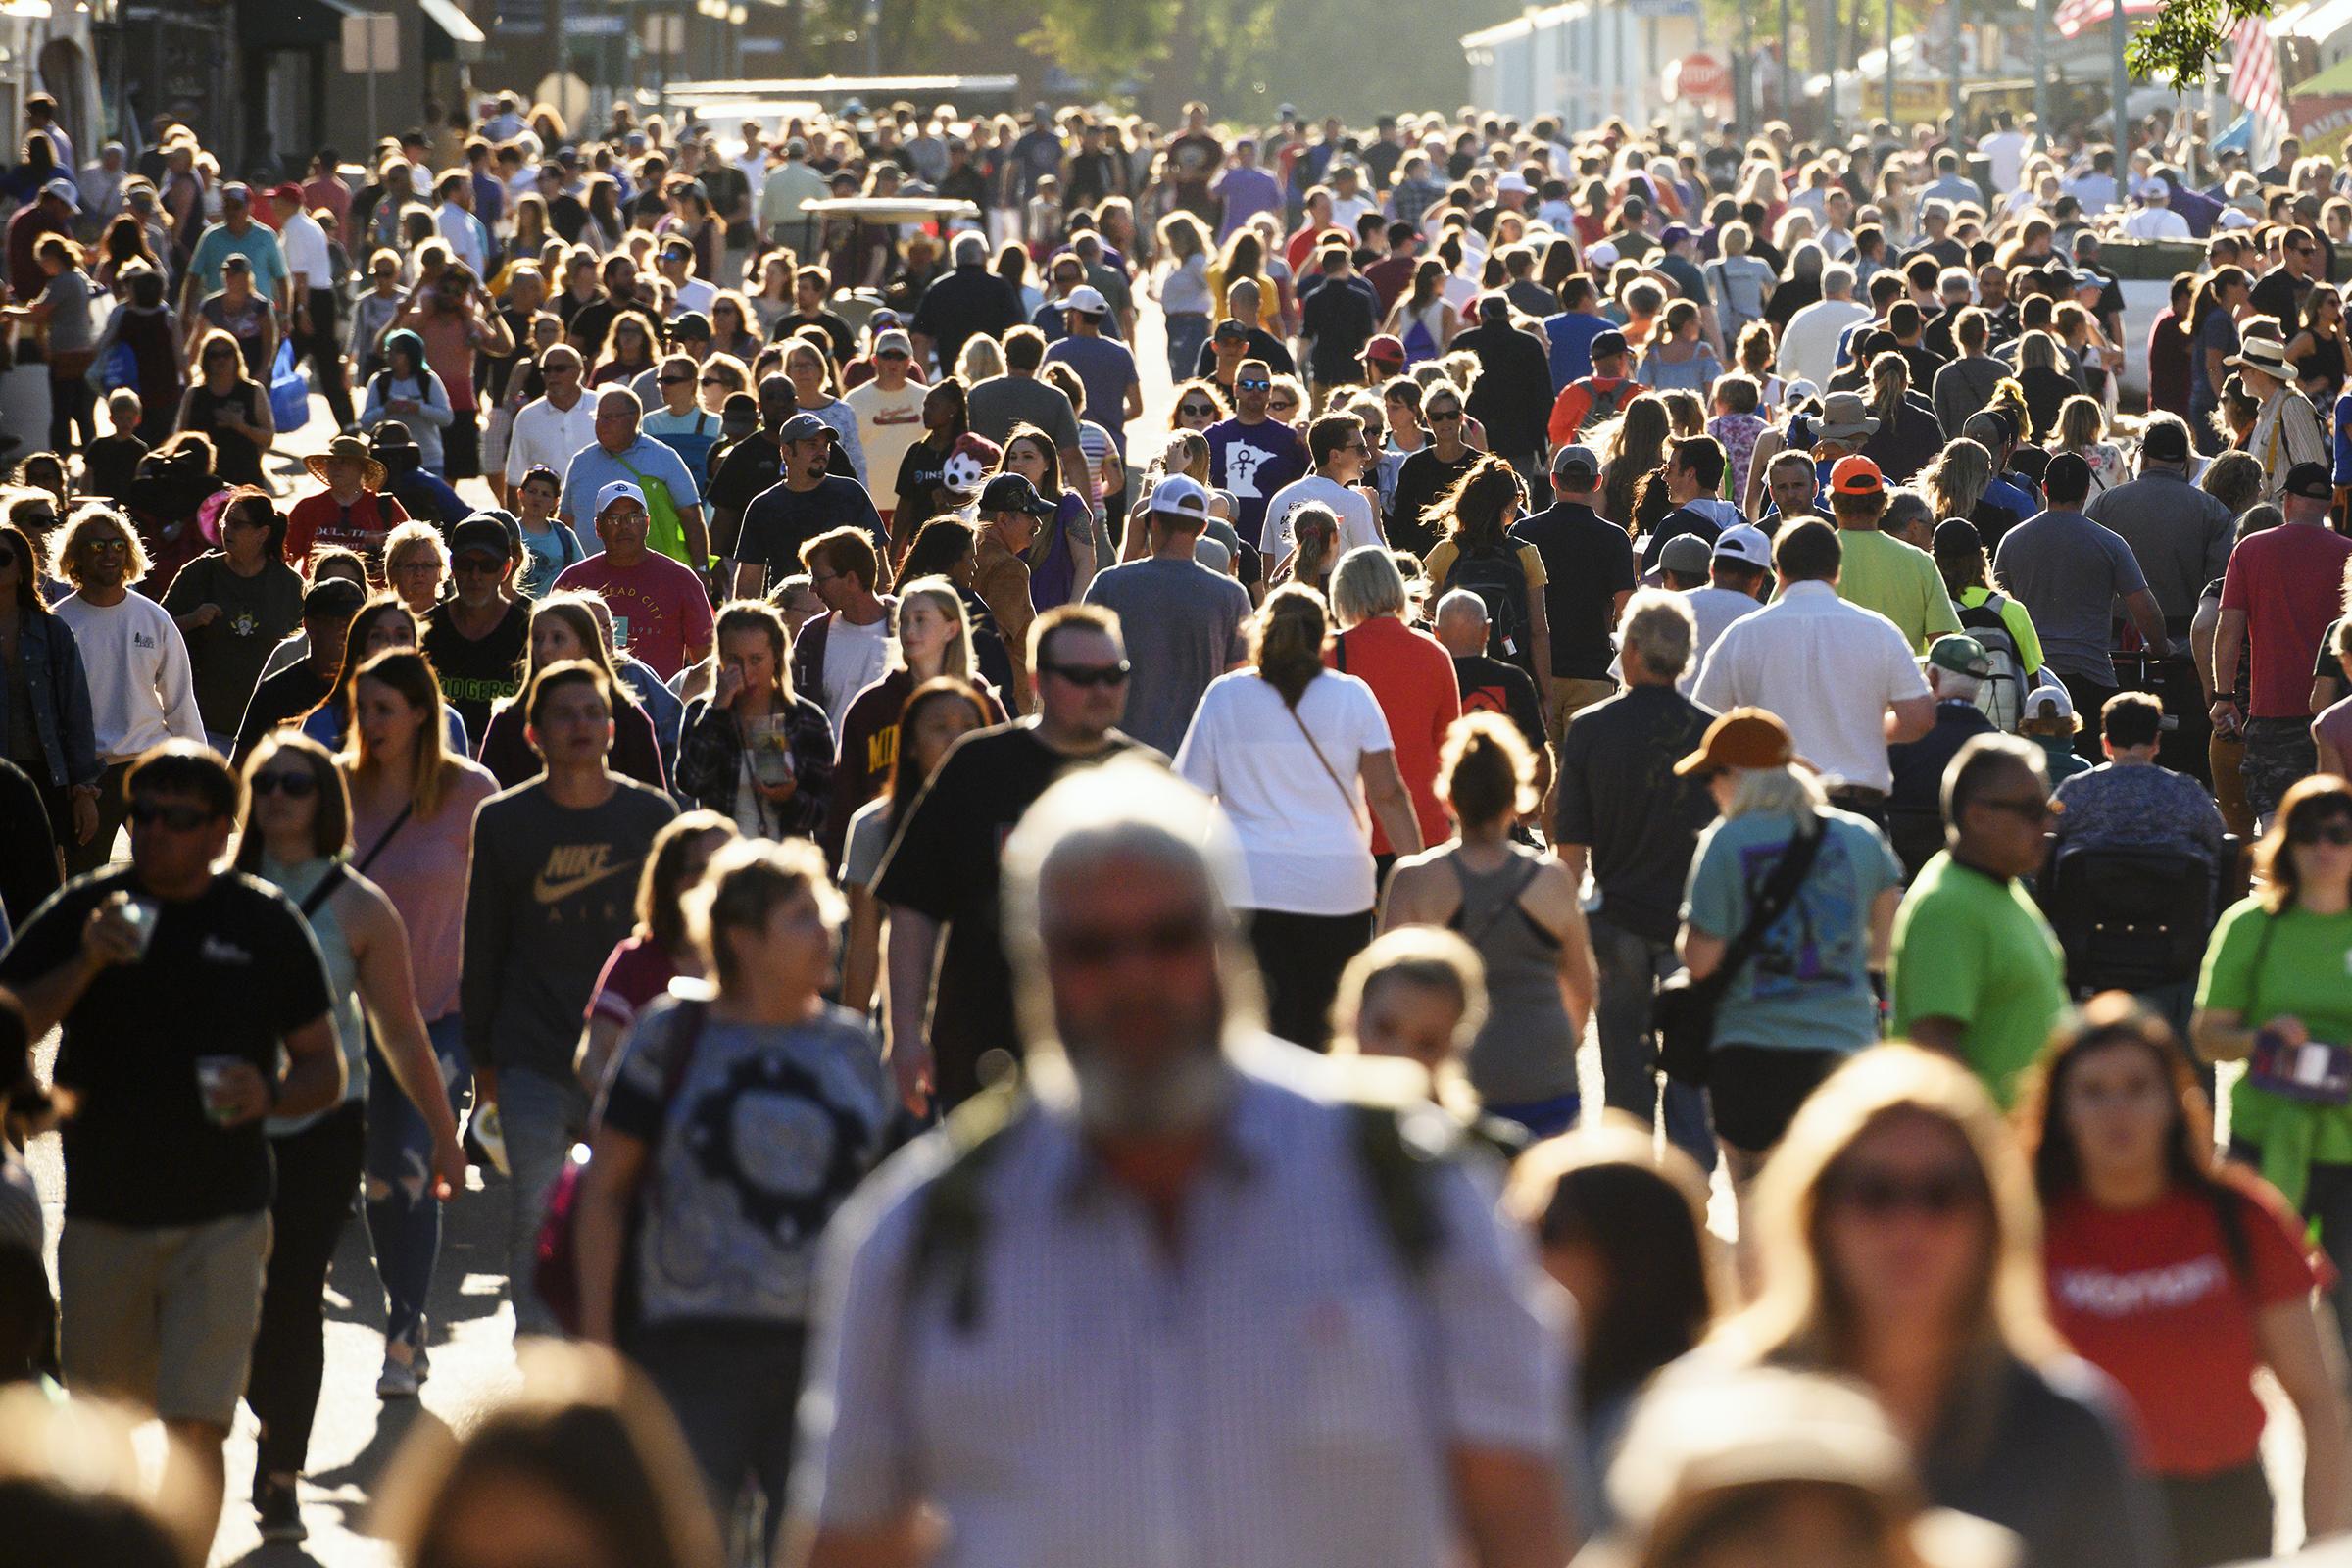 crowds002.jpg